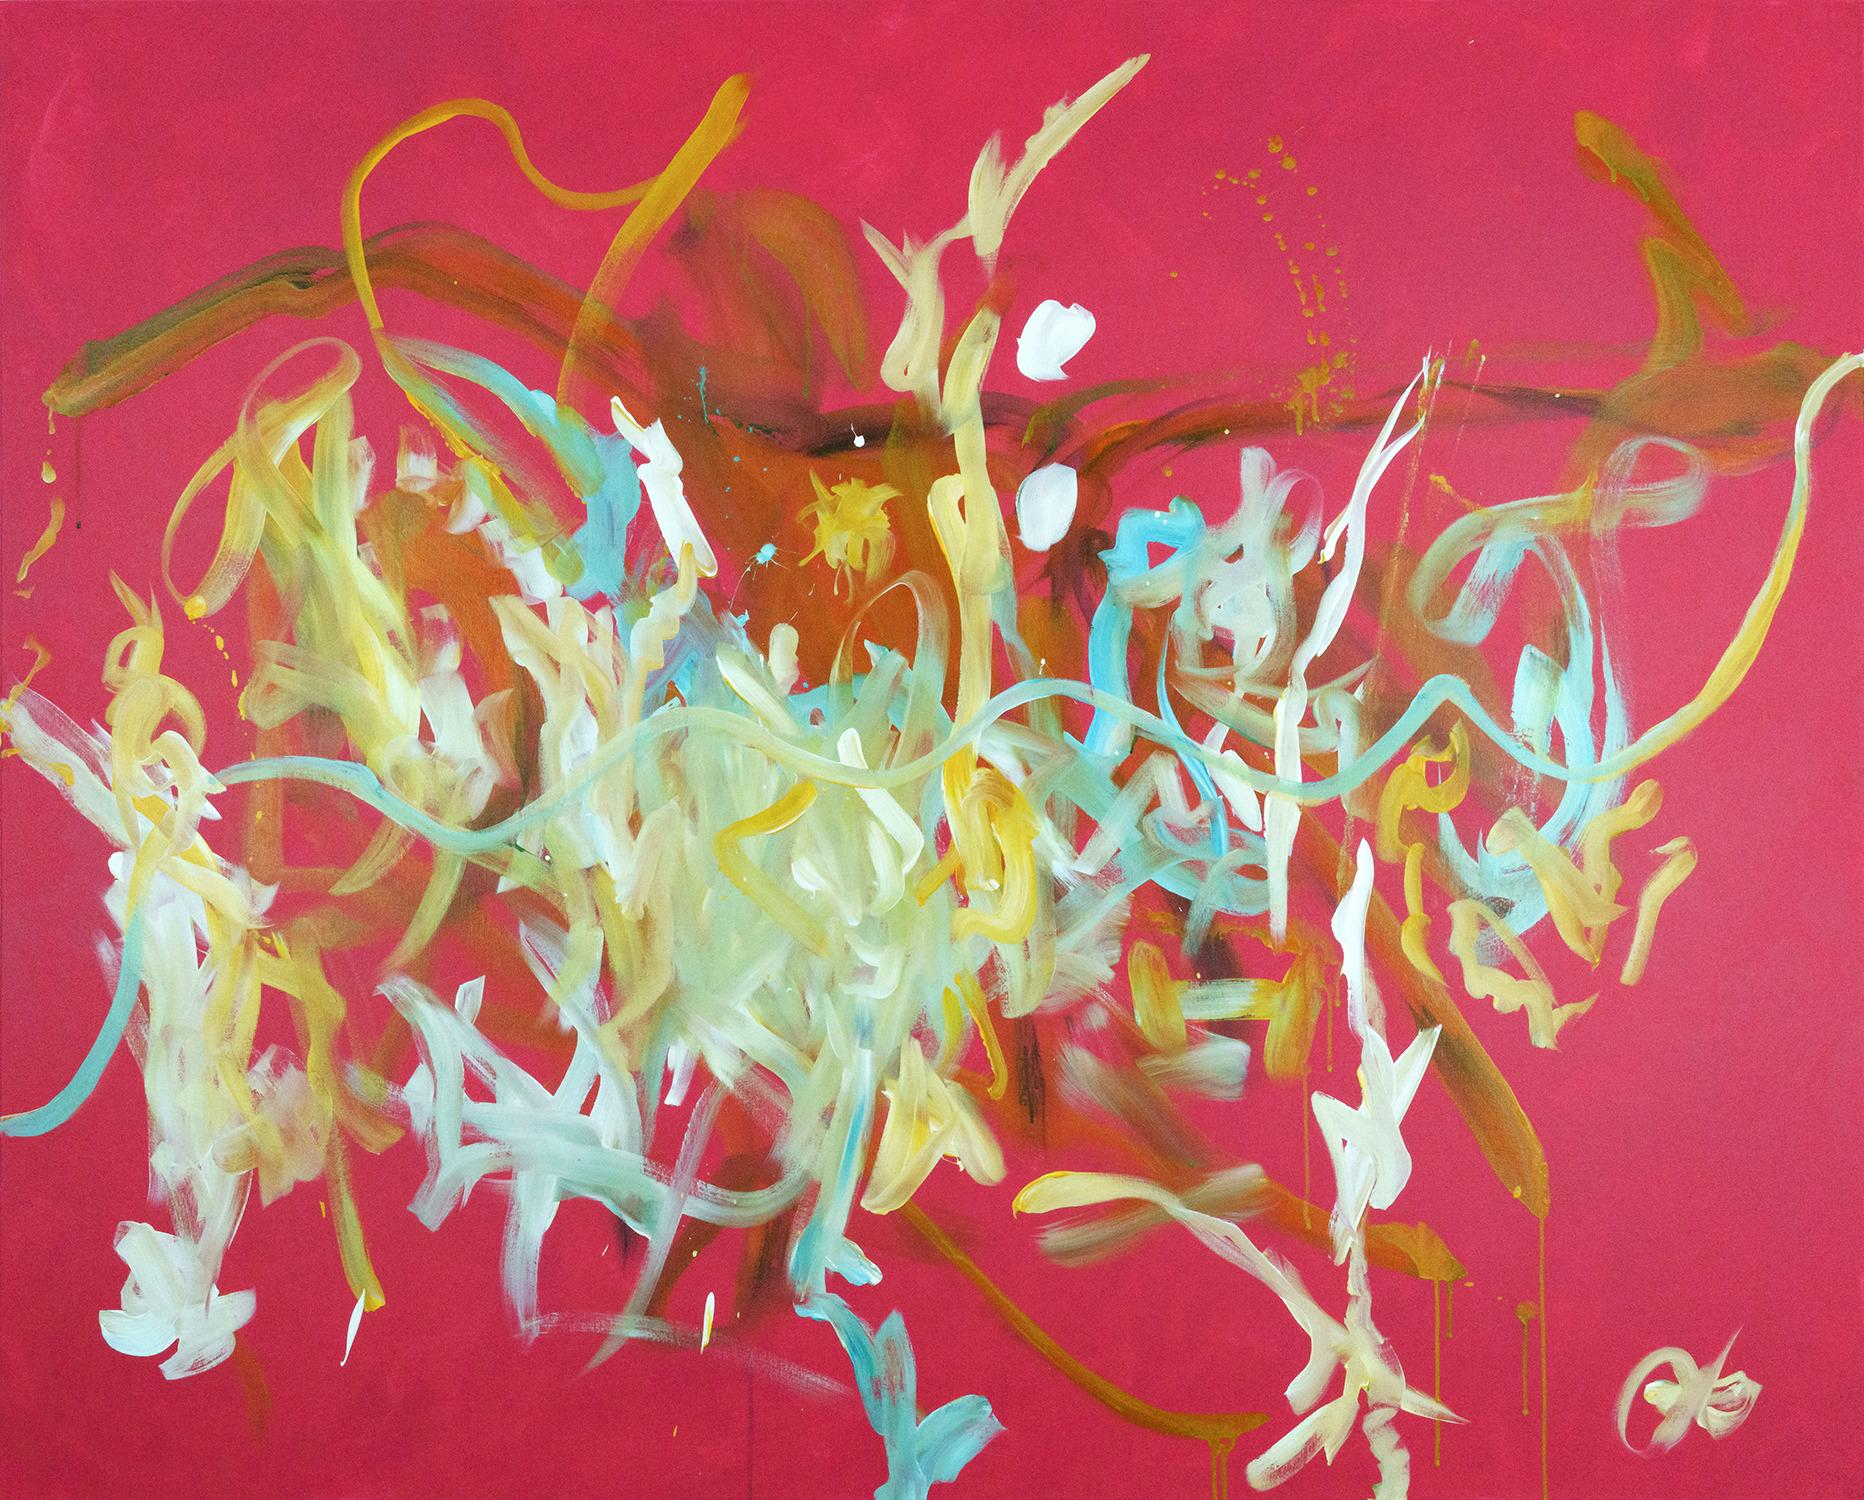 Katewilson.ferdinand.paintingoncanvas.48x60inches.2020.frontcrop.lr b2zuvs